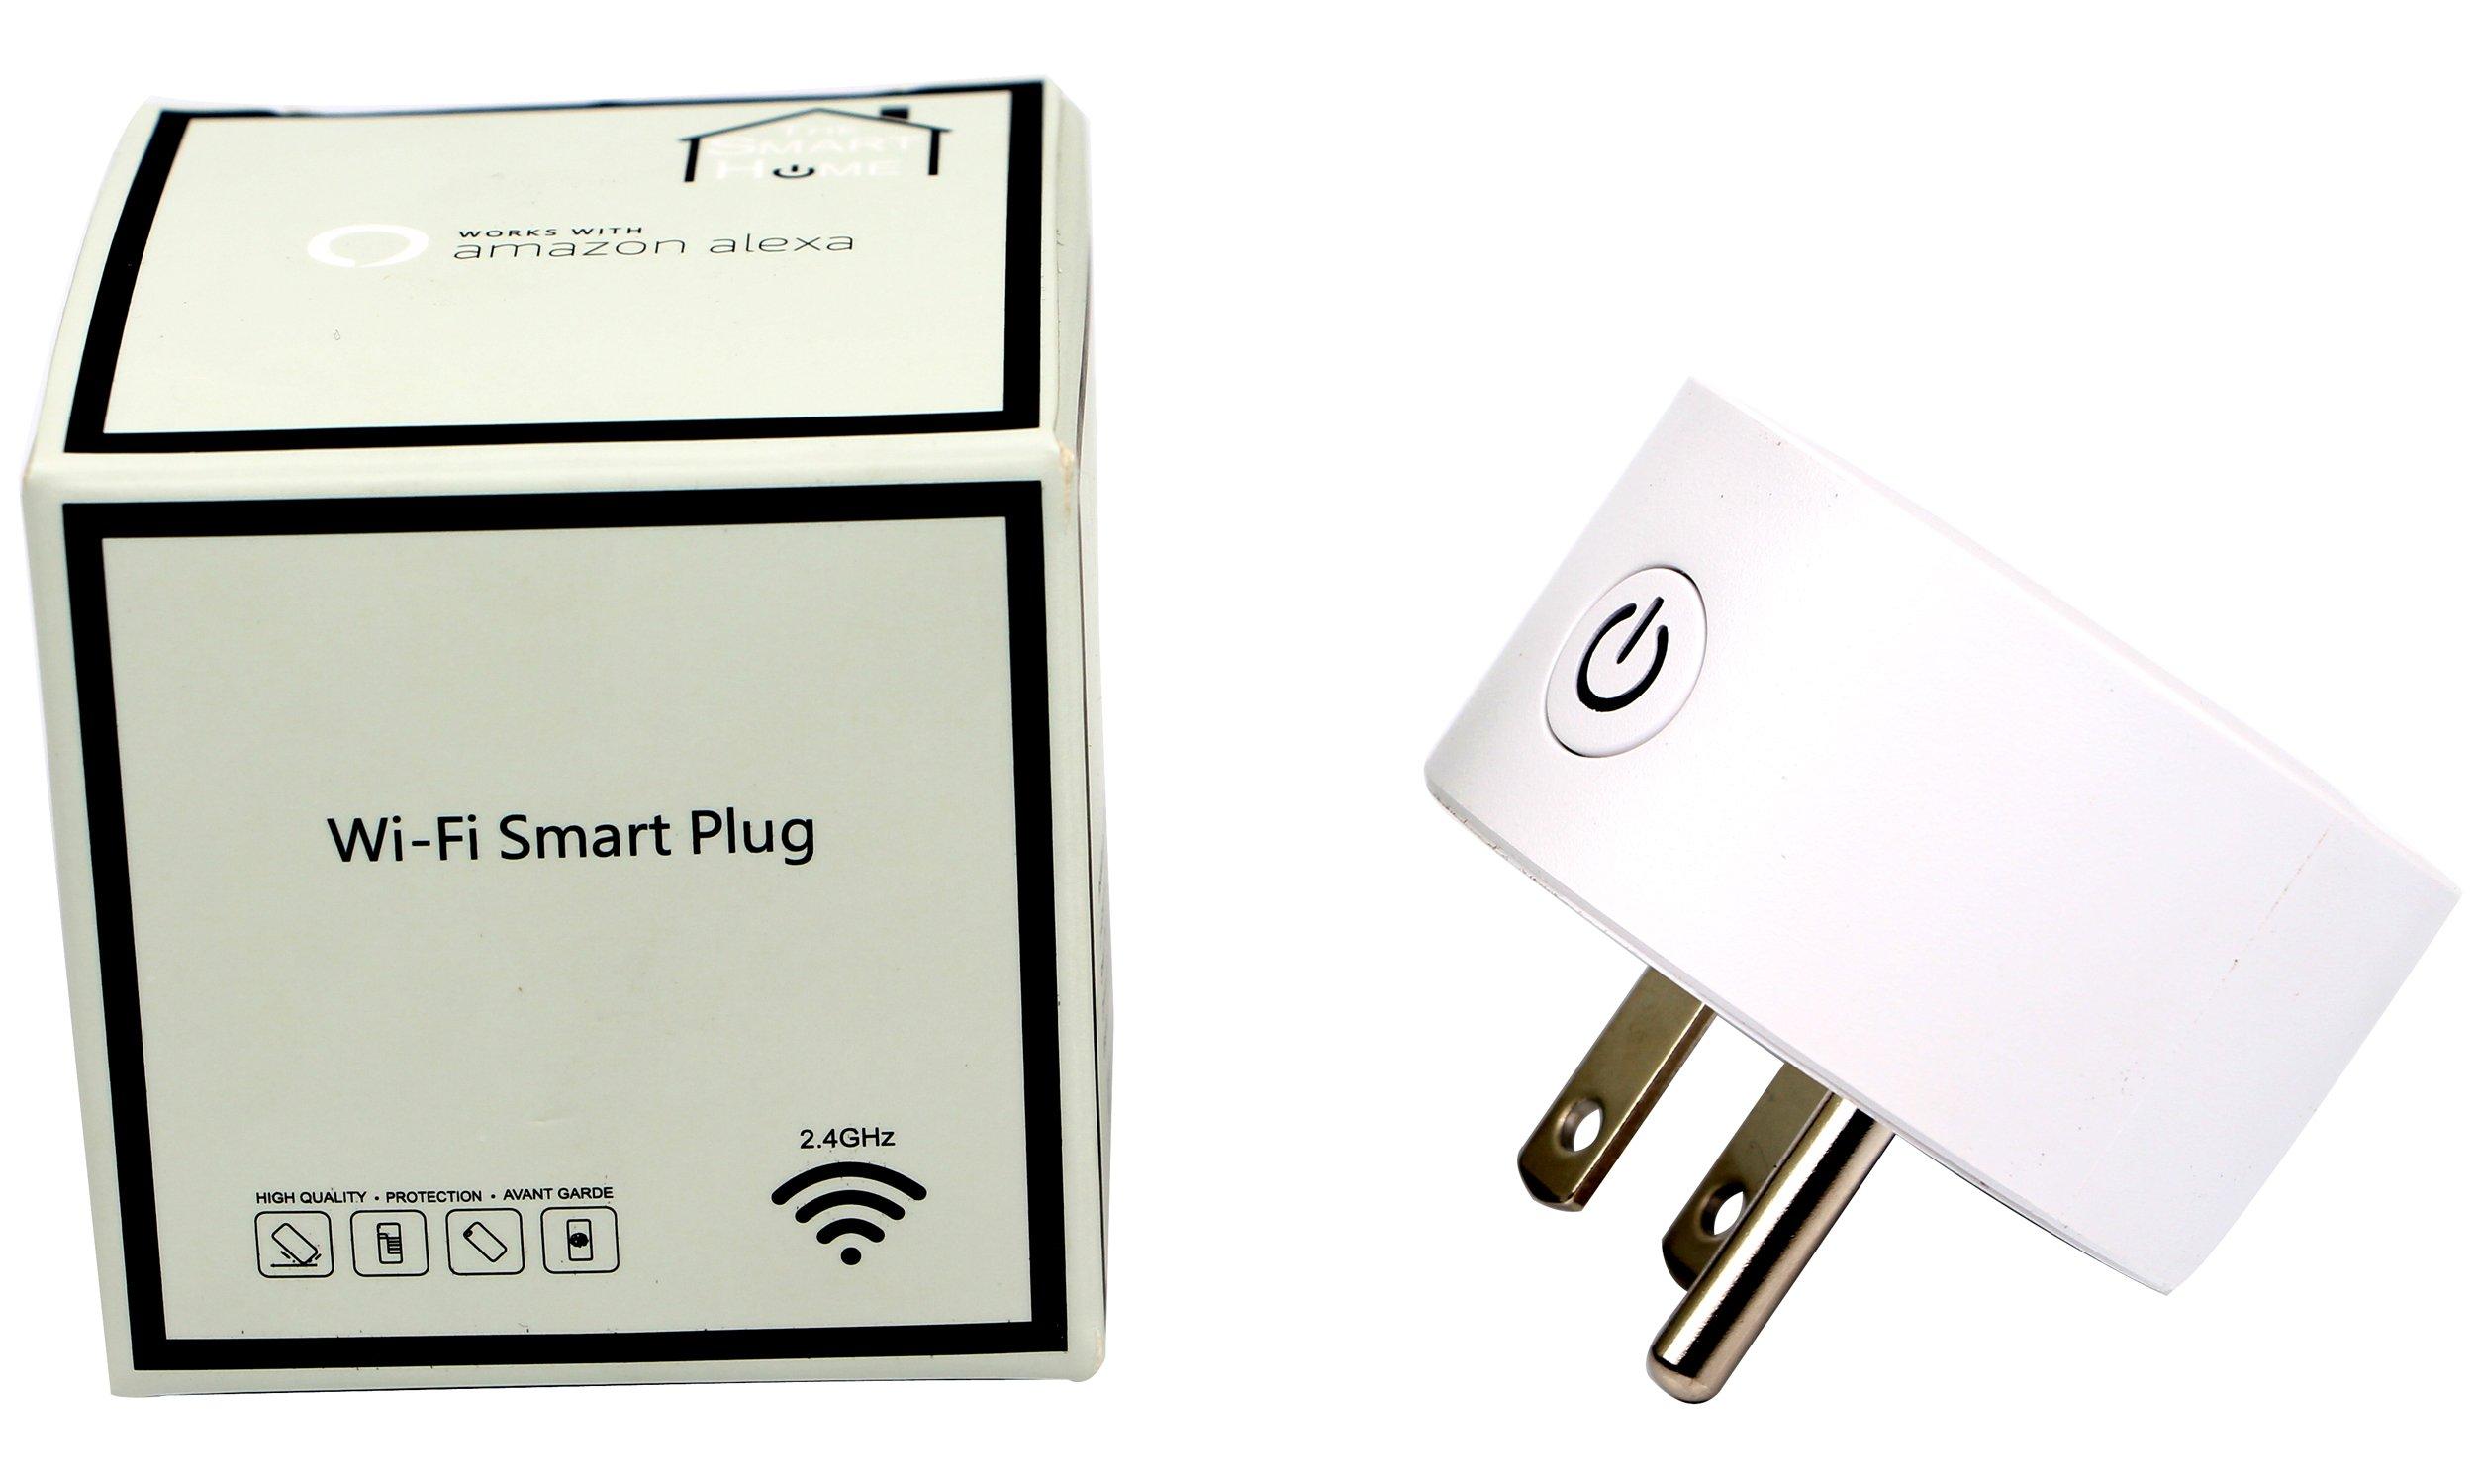 hierkryst Wireless Power Smart Plug Home Smart Socket Electrical Outlet